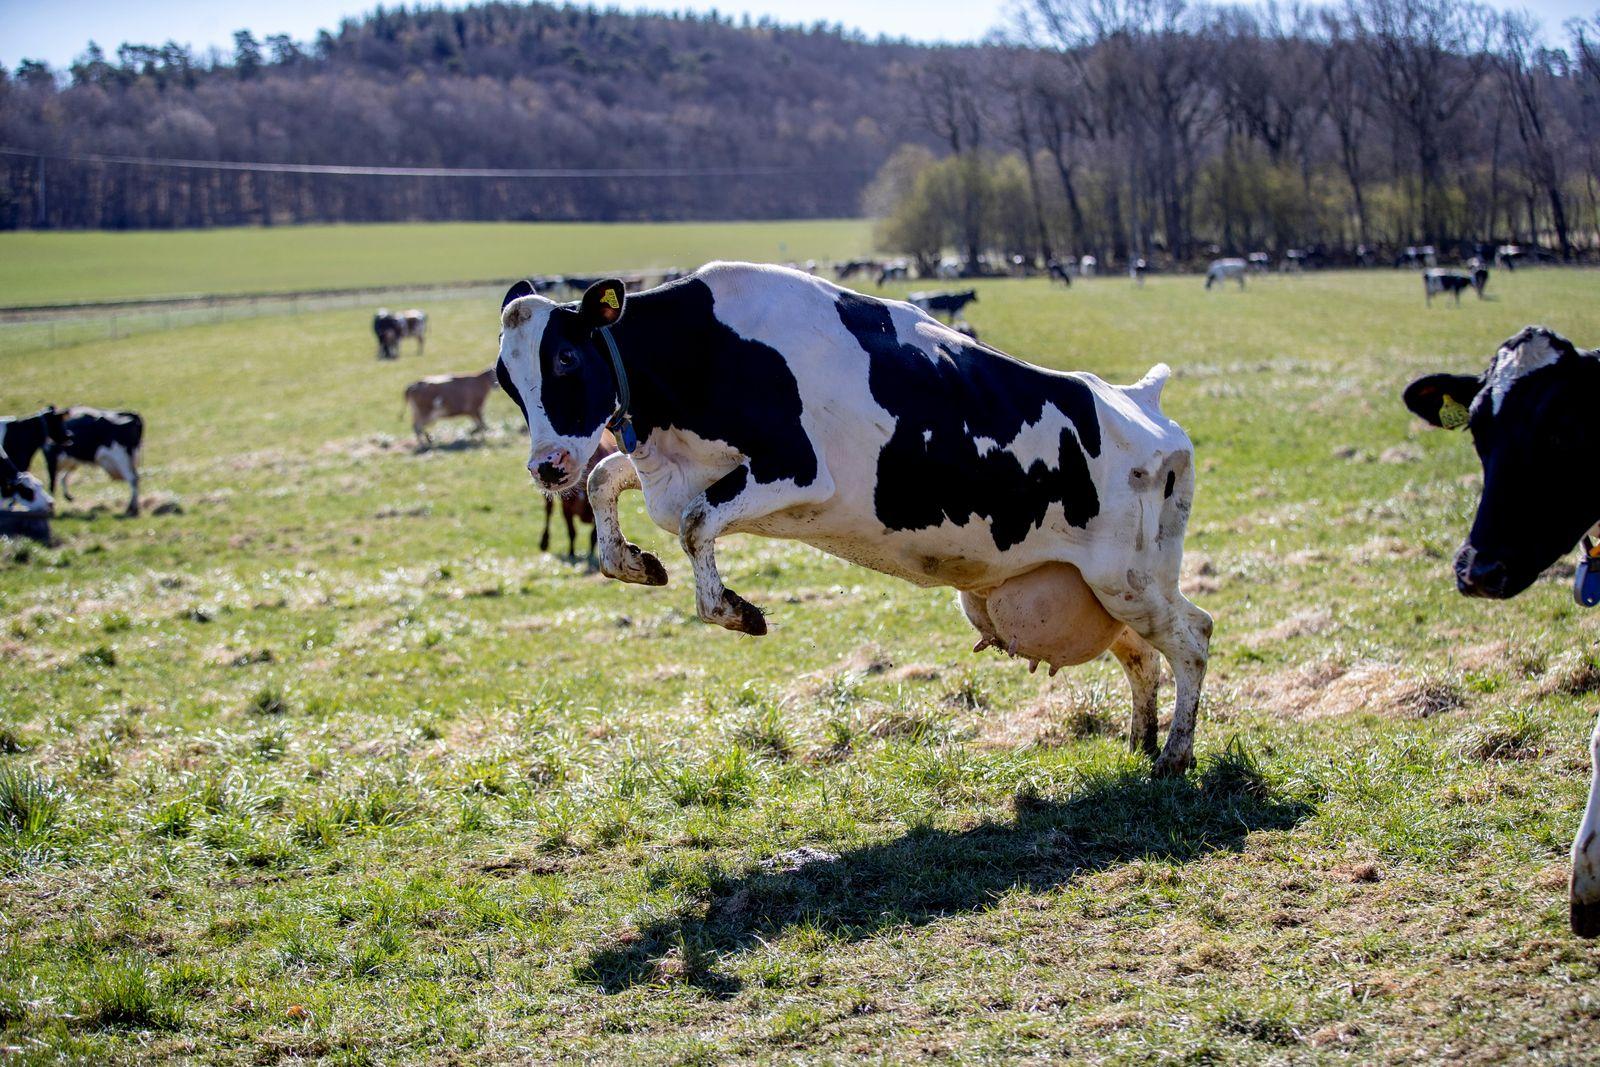 Cow release at the farm Berte Gard outside Falkenberg